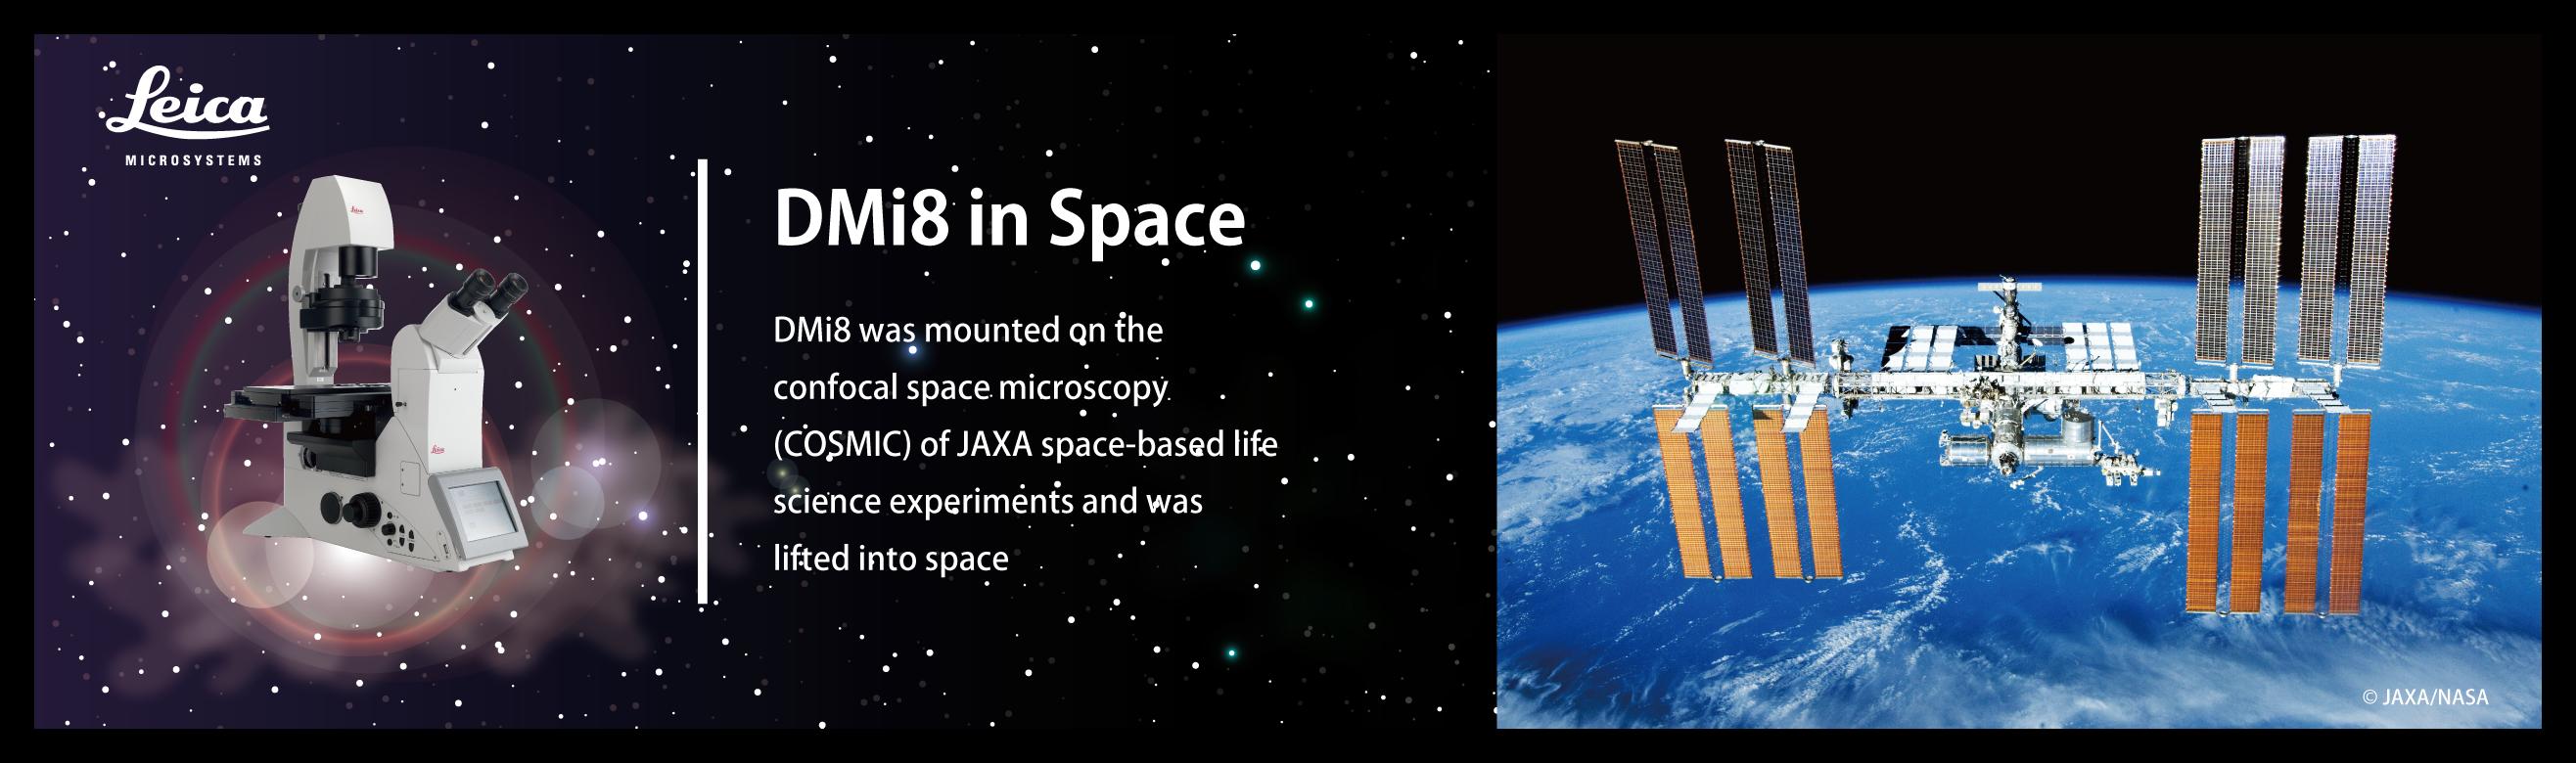 JAXAライフサイエンス宇宙実験のライブイメージングシステムに、倒立顕微鏡DMi8が搭載され、宇宙に行きました!